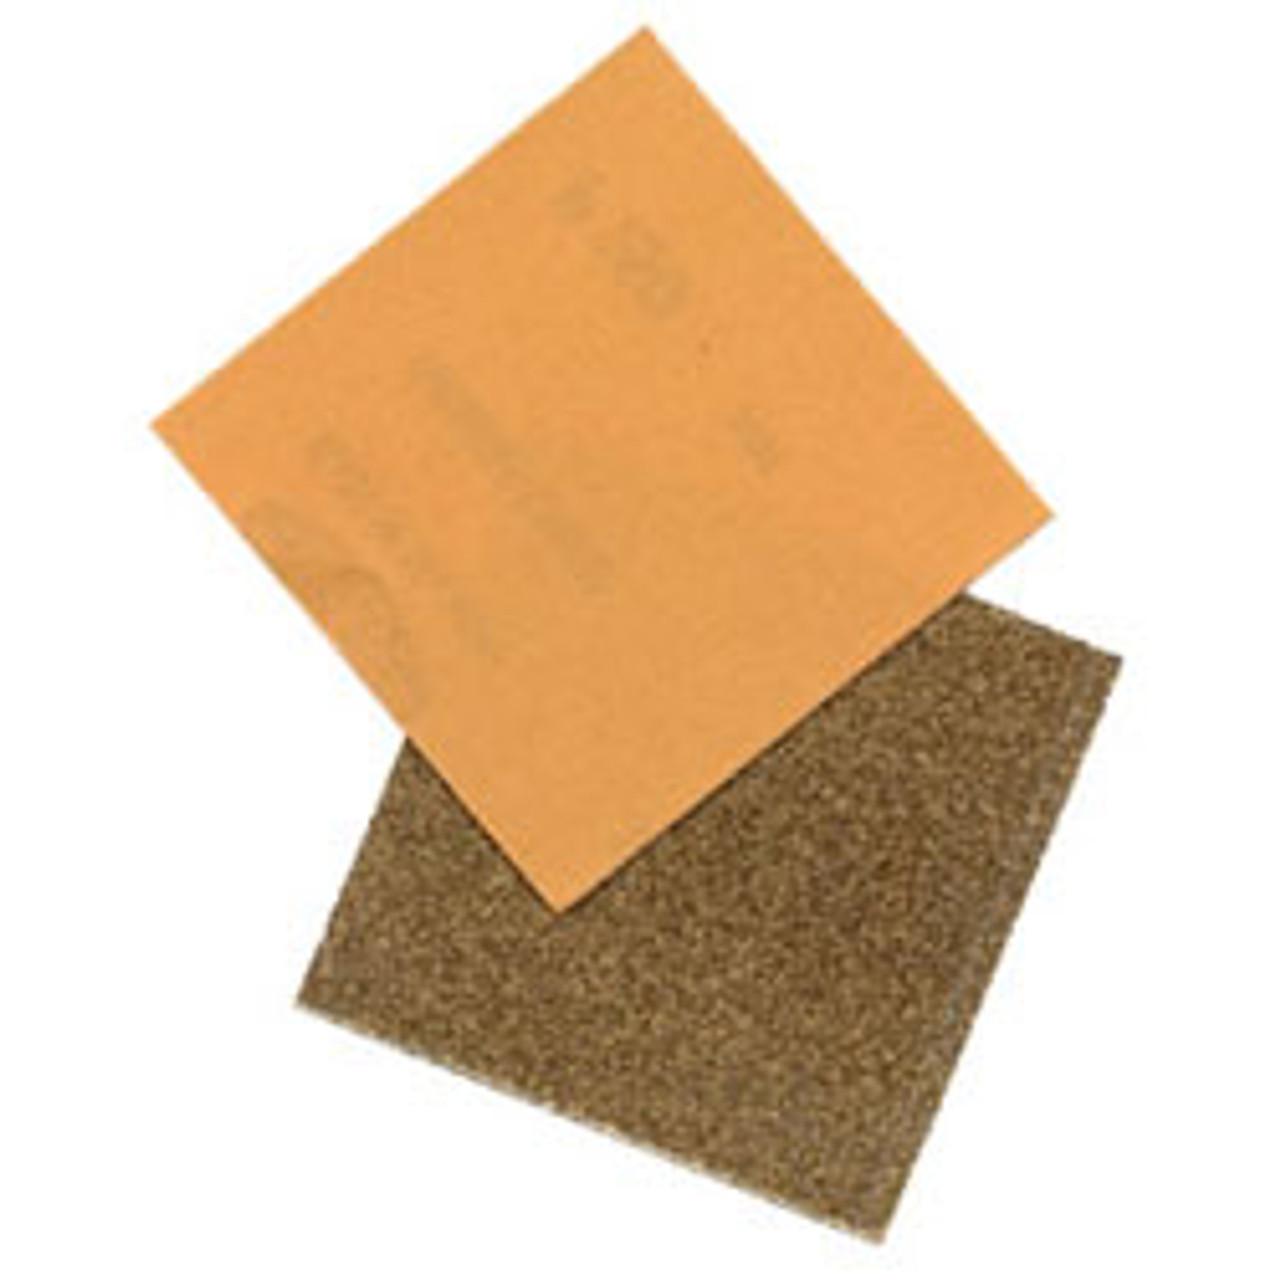 "Klingspor Abrasives Lightweight Aluminum Oxide, 4-1/2""x 4-1/2"" PSA Sheets, 120 Grit, 5pk"